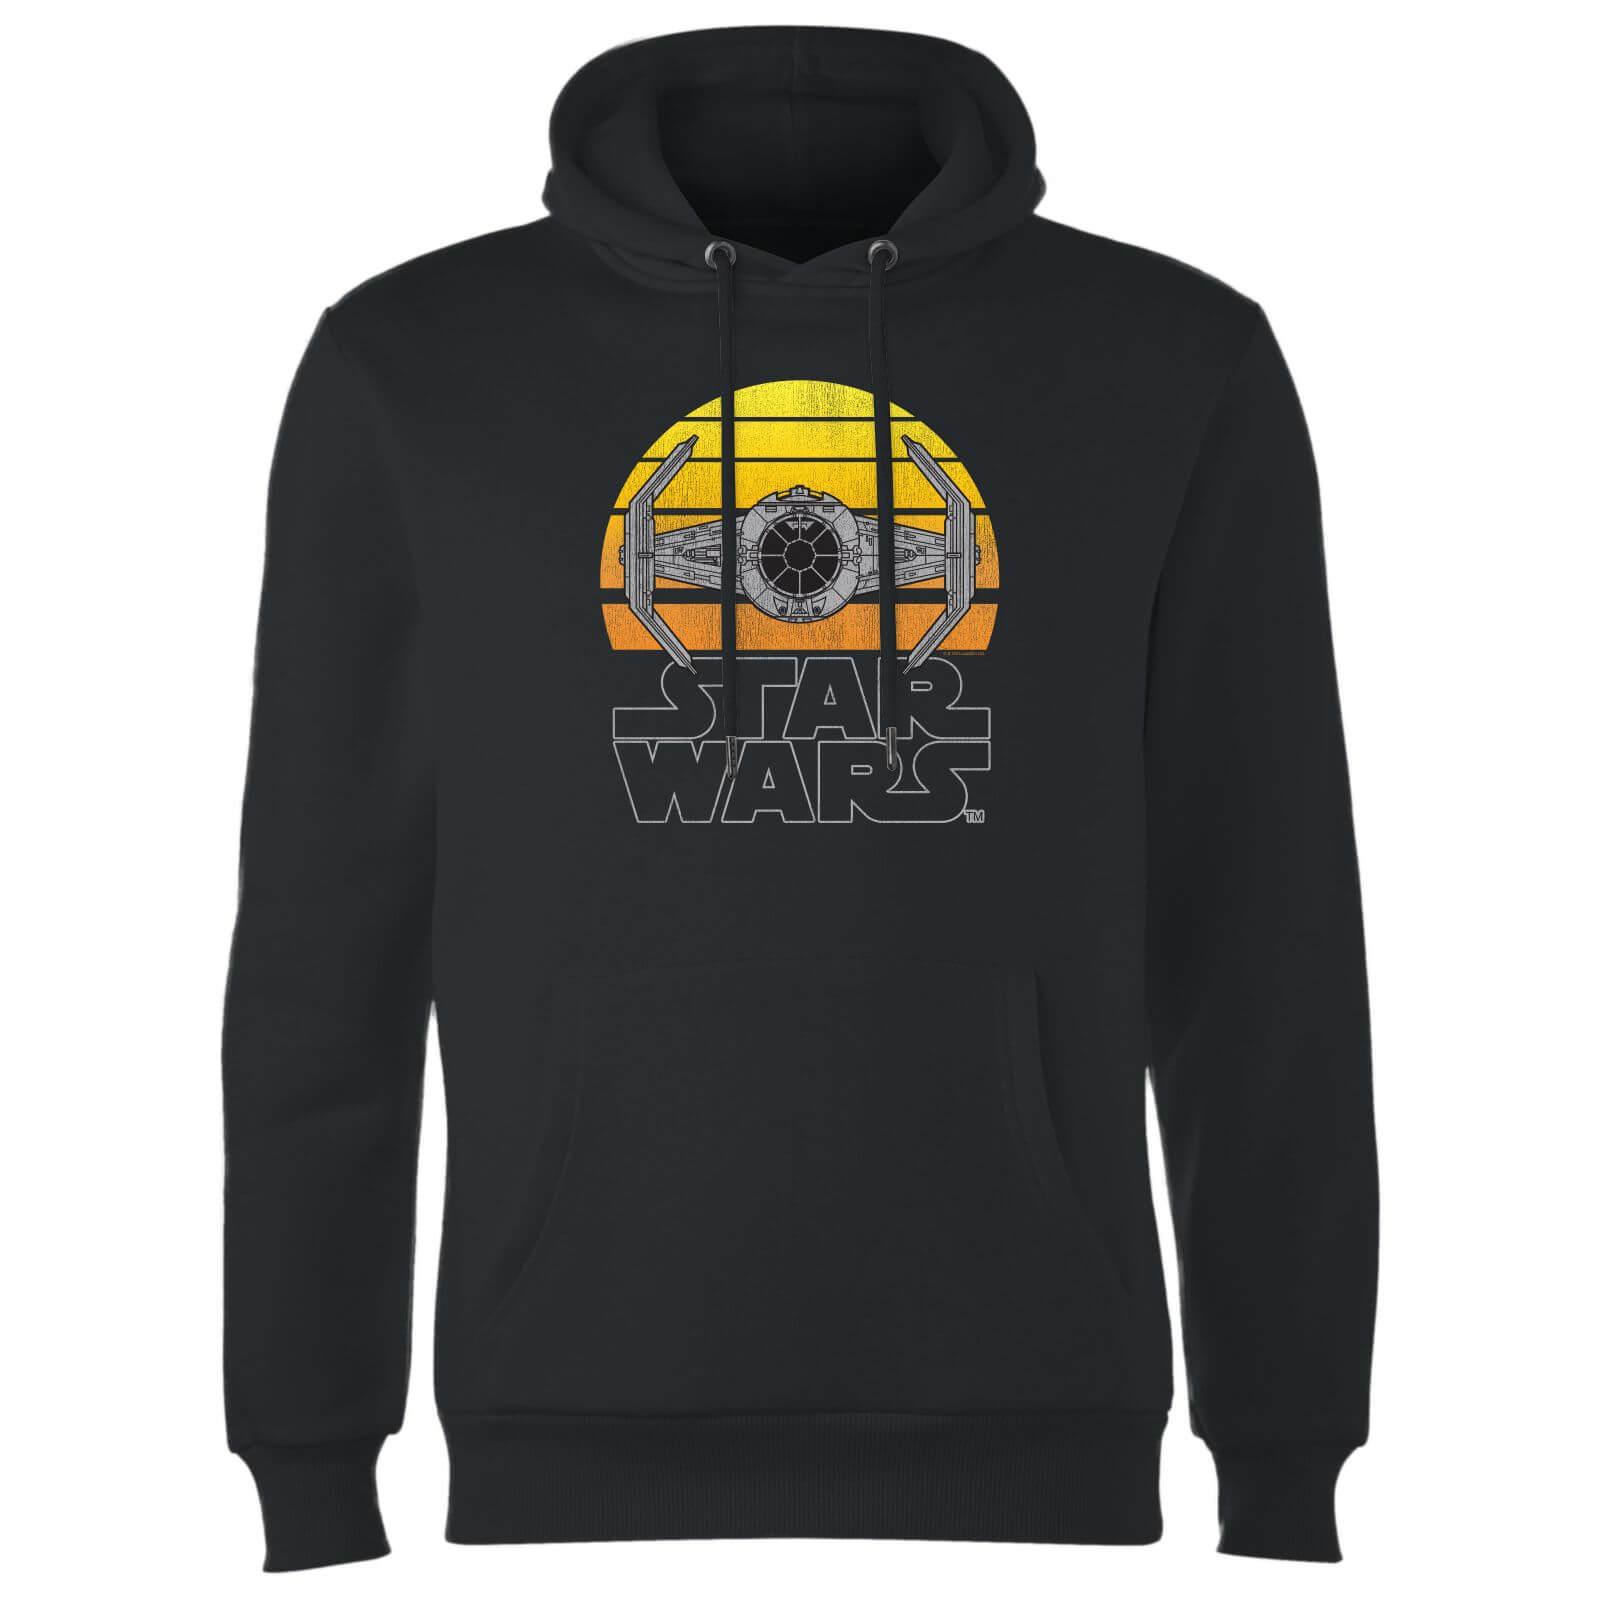 Star Wars Sunset Tie Hoodie - Black - XXL - Black